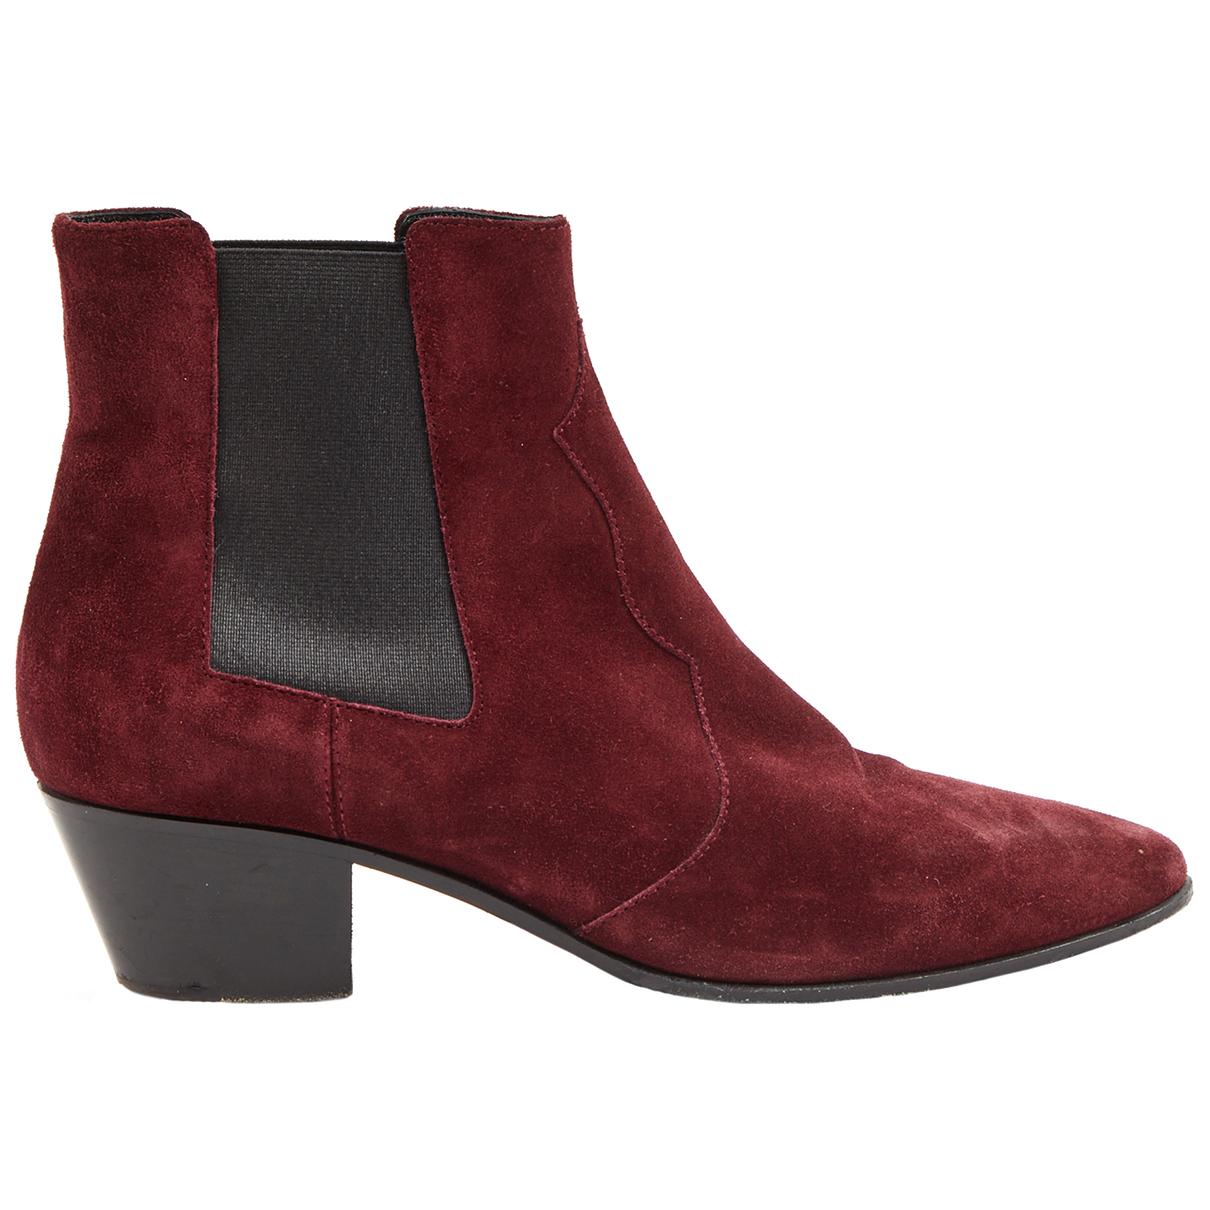 Saint Laurent \N Burgundy Suede Ankle boots for Women 39 EU